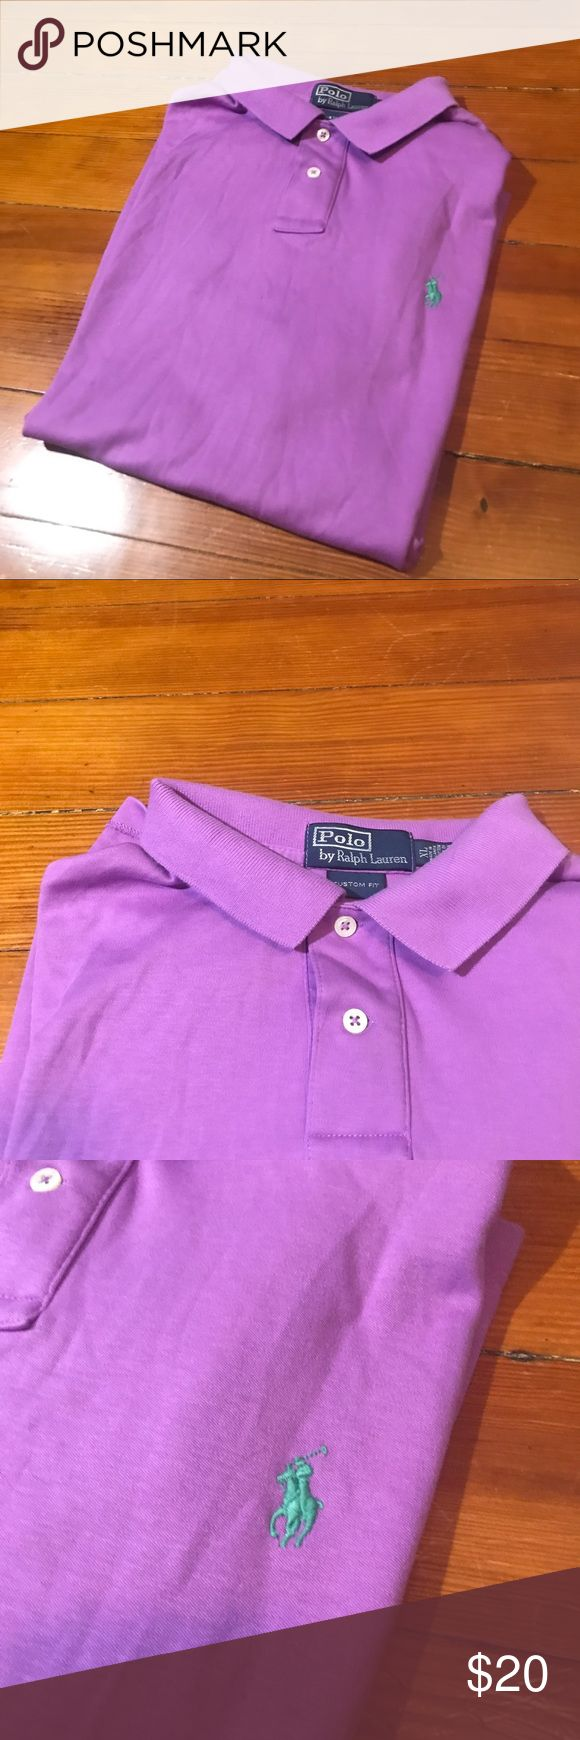 Men's Purple & Teal Ralph Lauren Polo Men's purple with teal Ralph Lauren logo. Size XL Polo by Ralph Lauren Shirts Polos